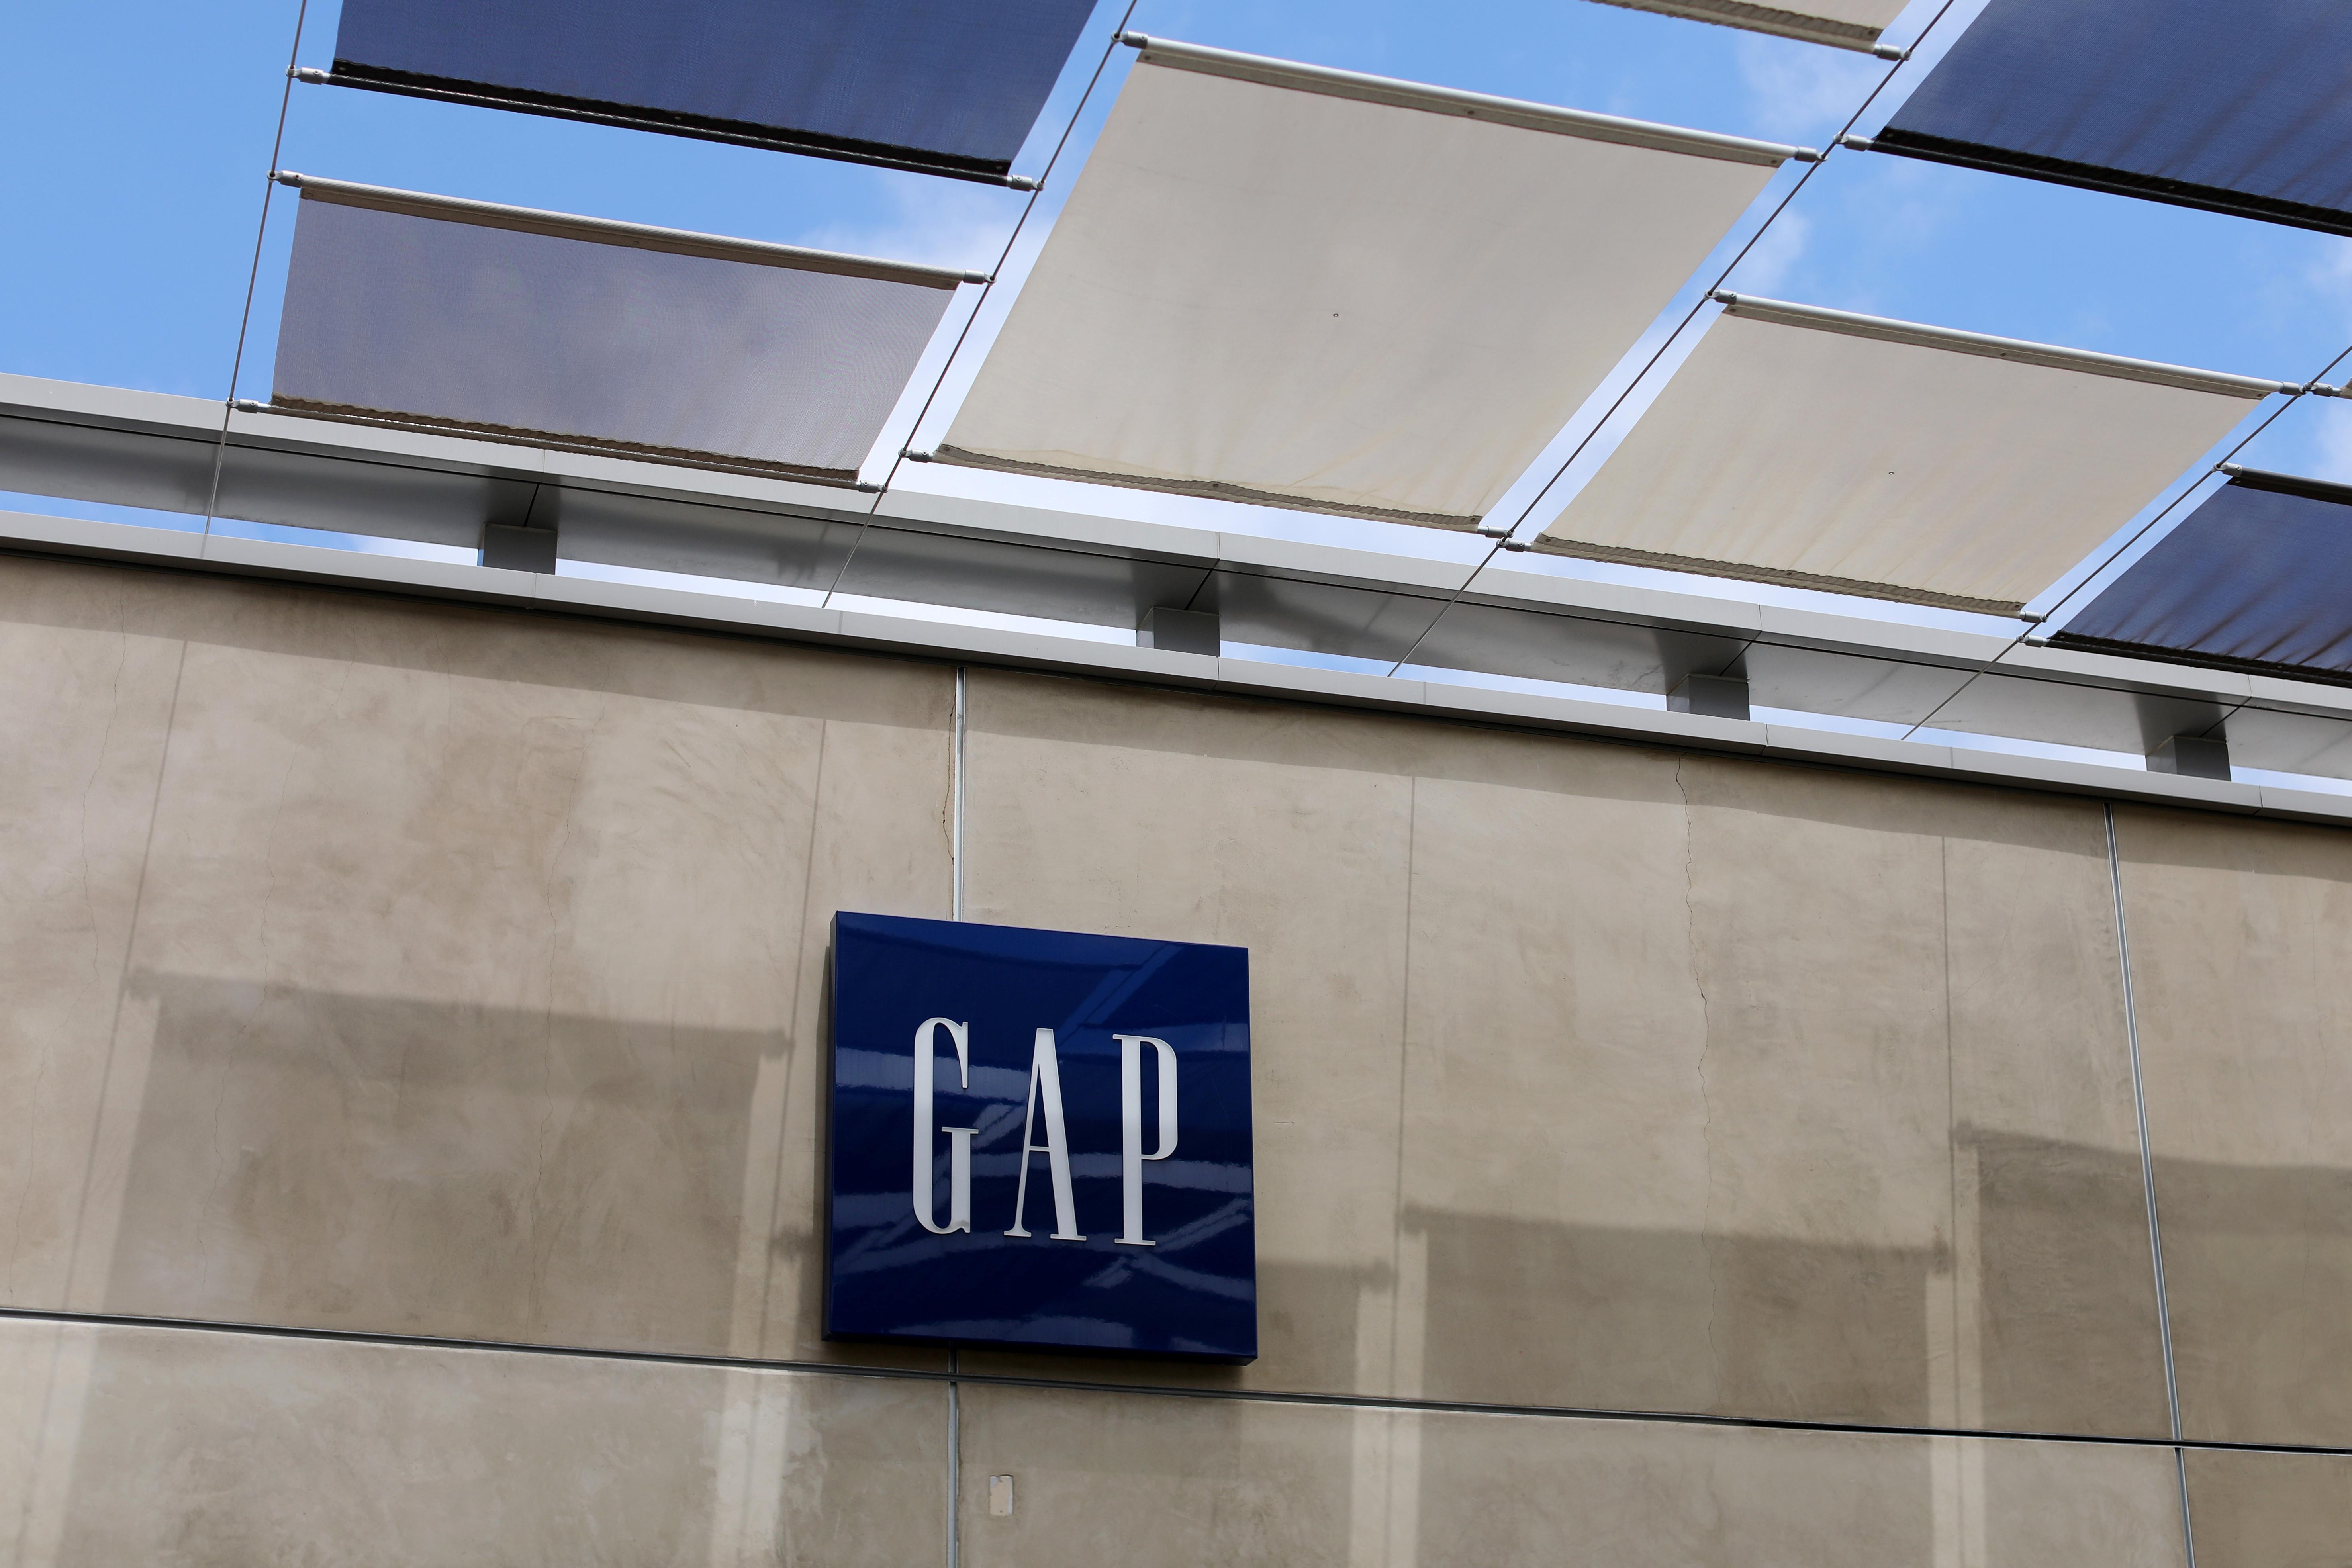 A Gap Inc. retail store is shown in La Jolla, California, U.S., May 17, 2017. REUTERS/Mike Blake